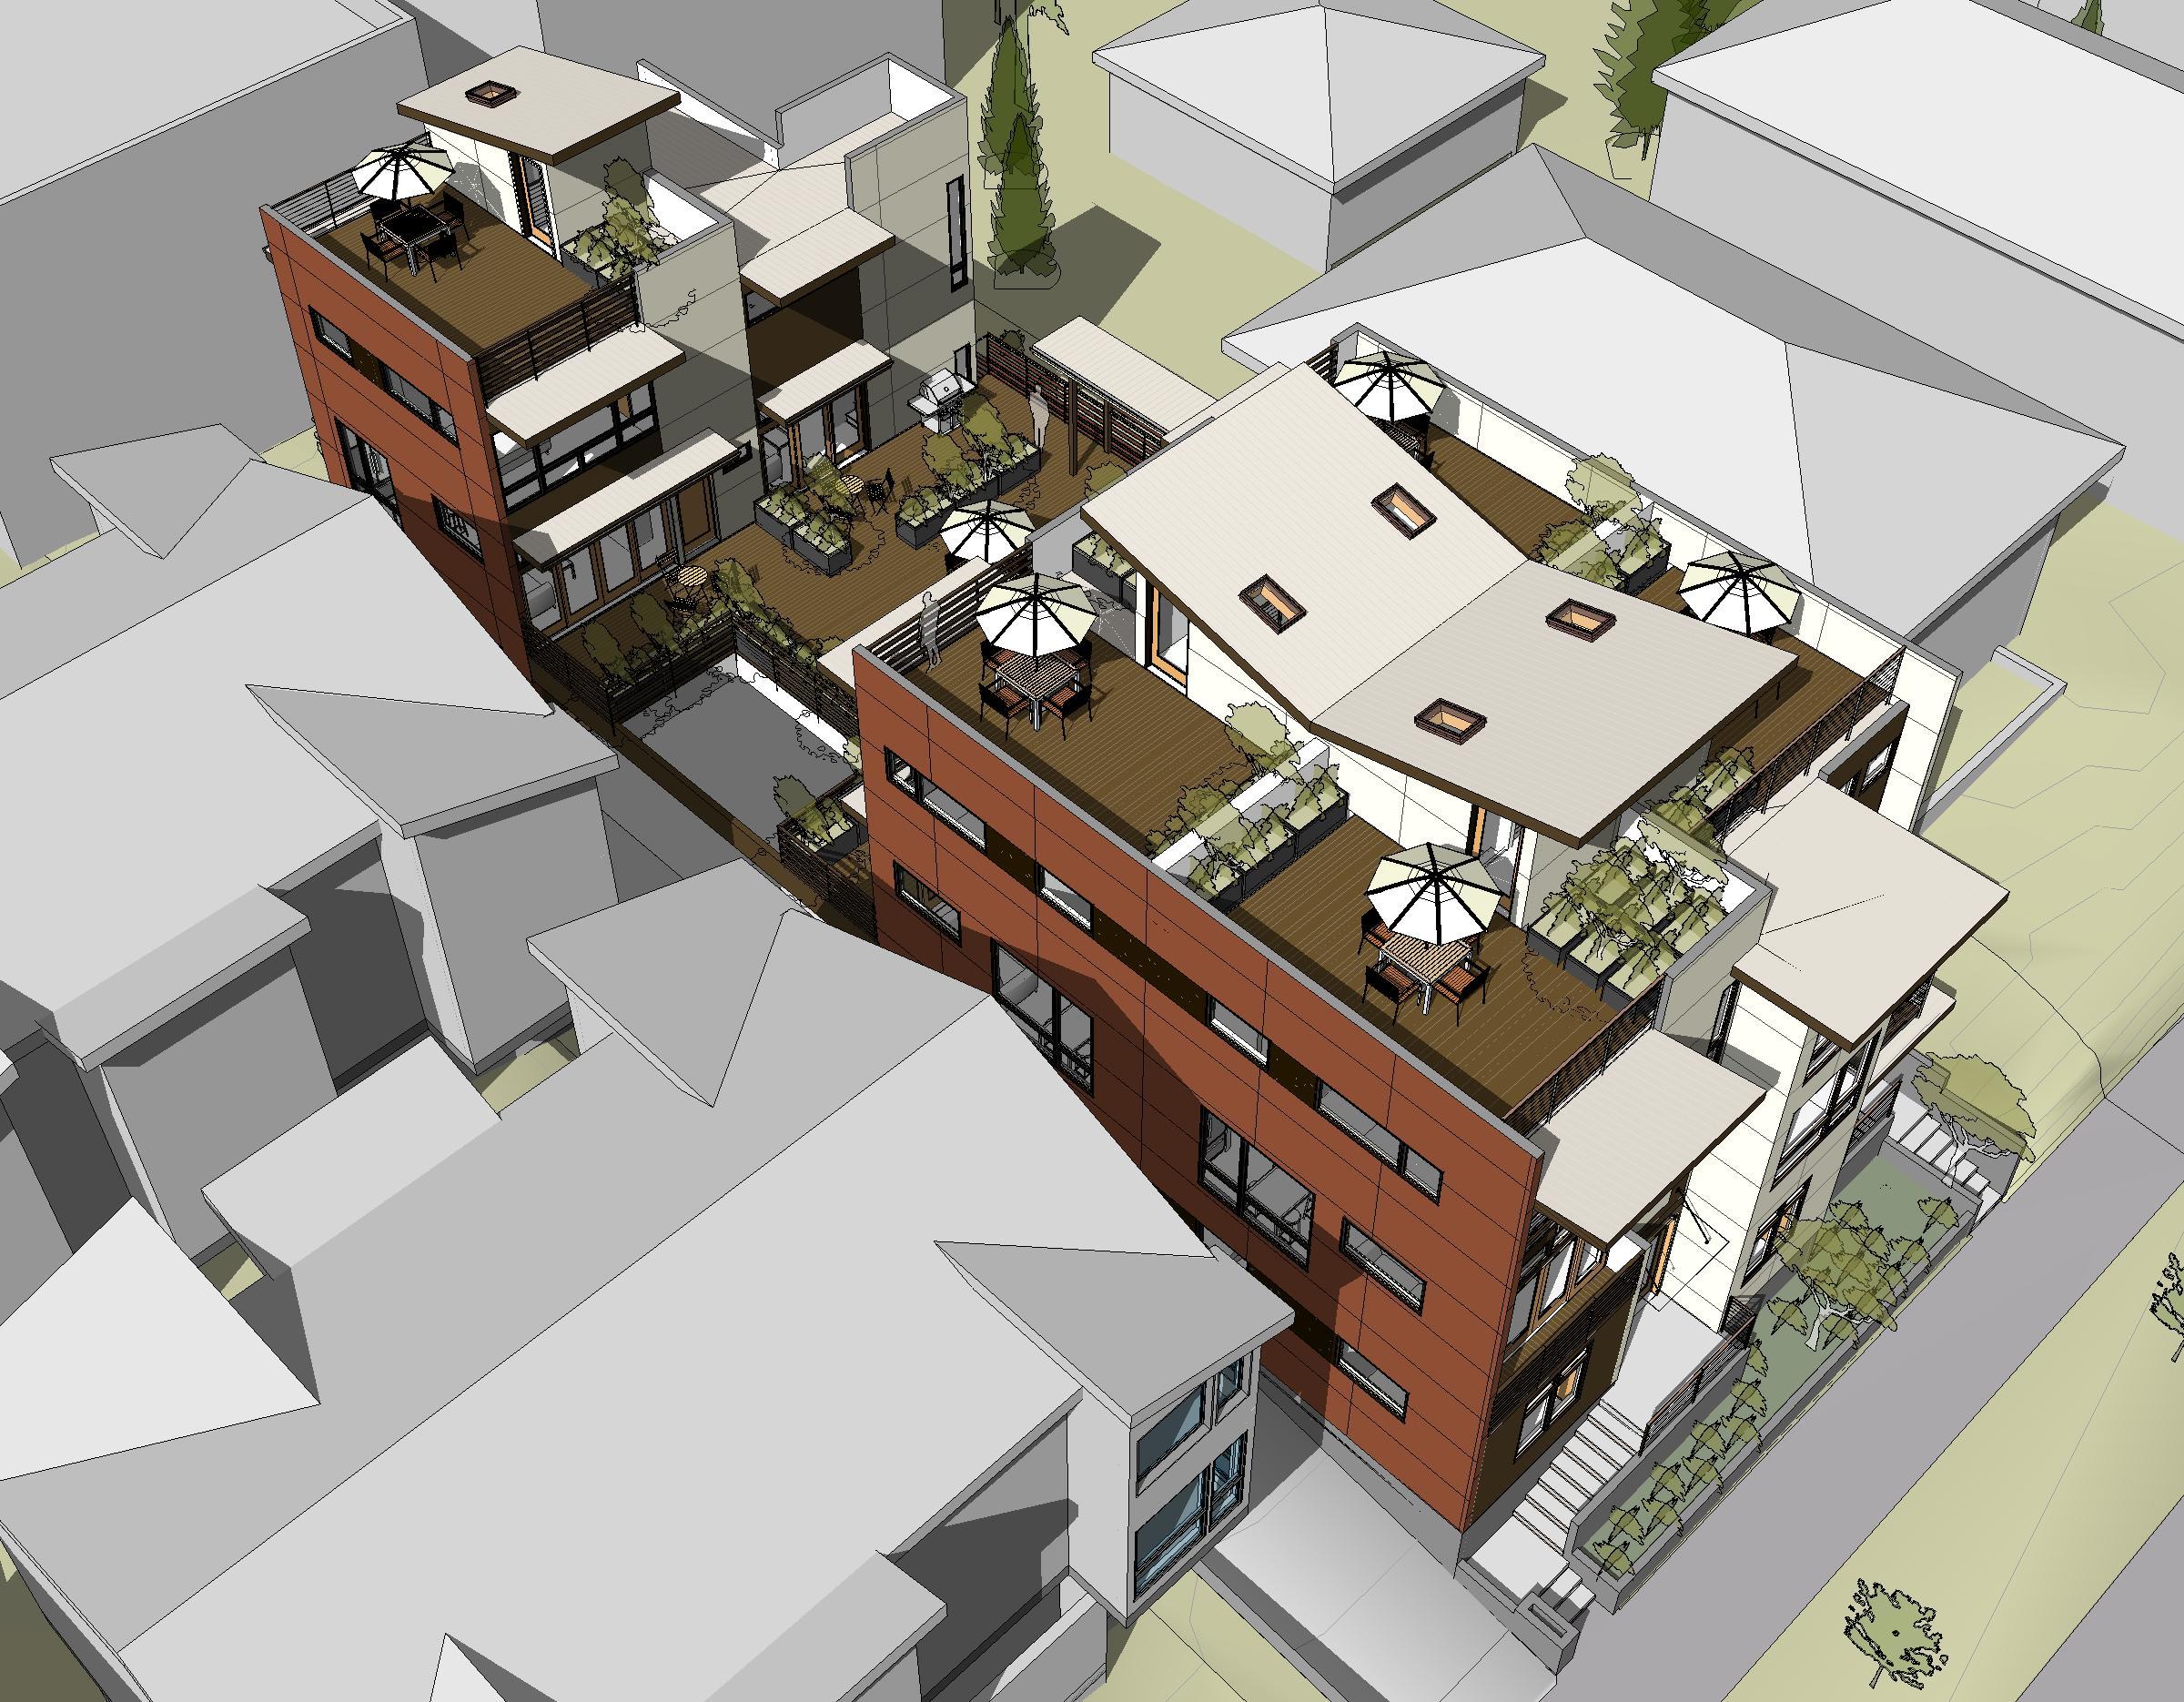 Beacon_Green_David_Neiman_Architects_print.jpg